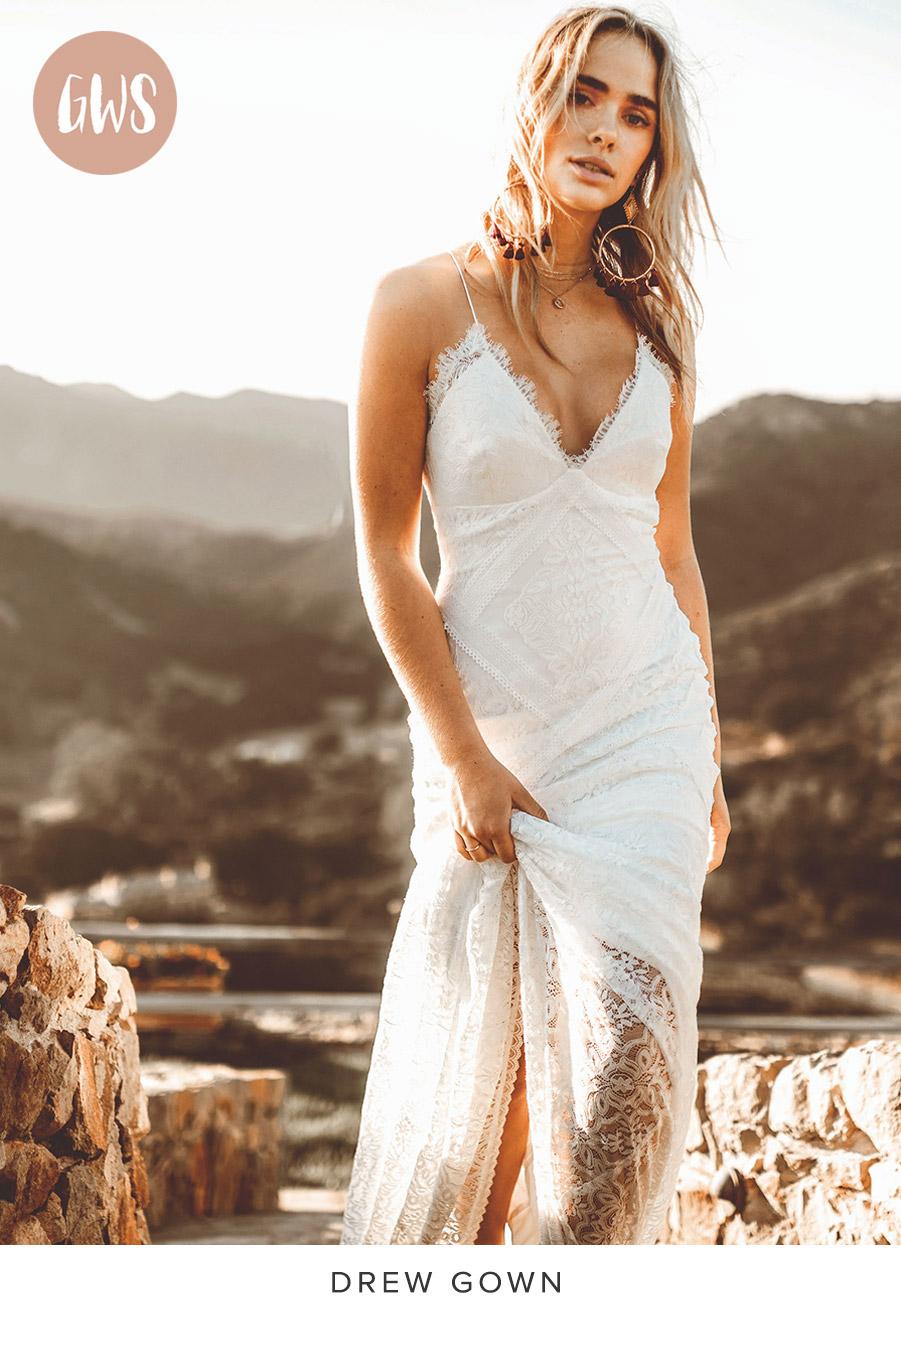 Drew Gown